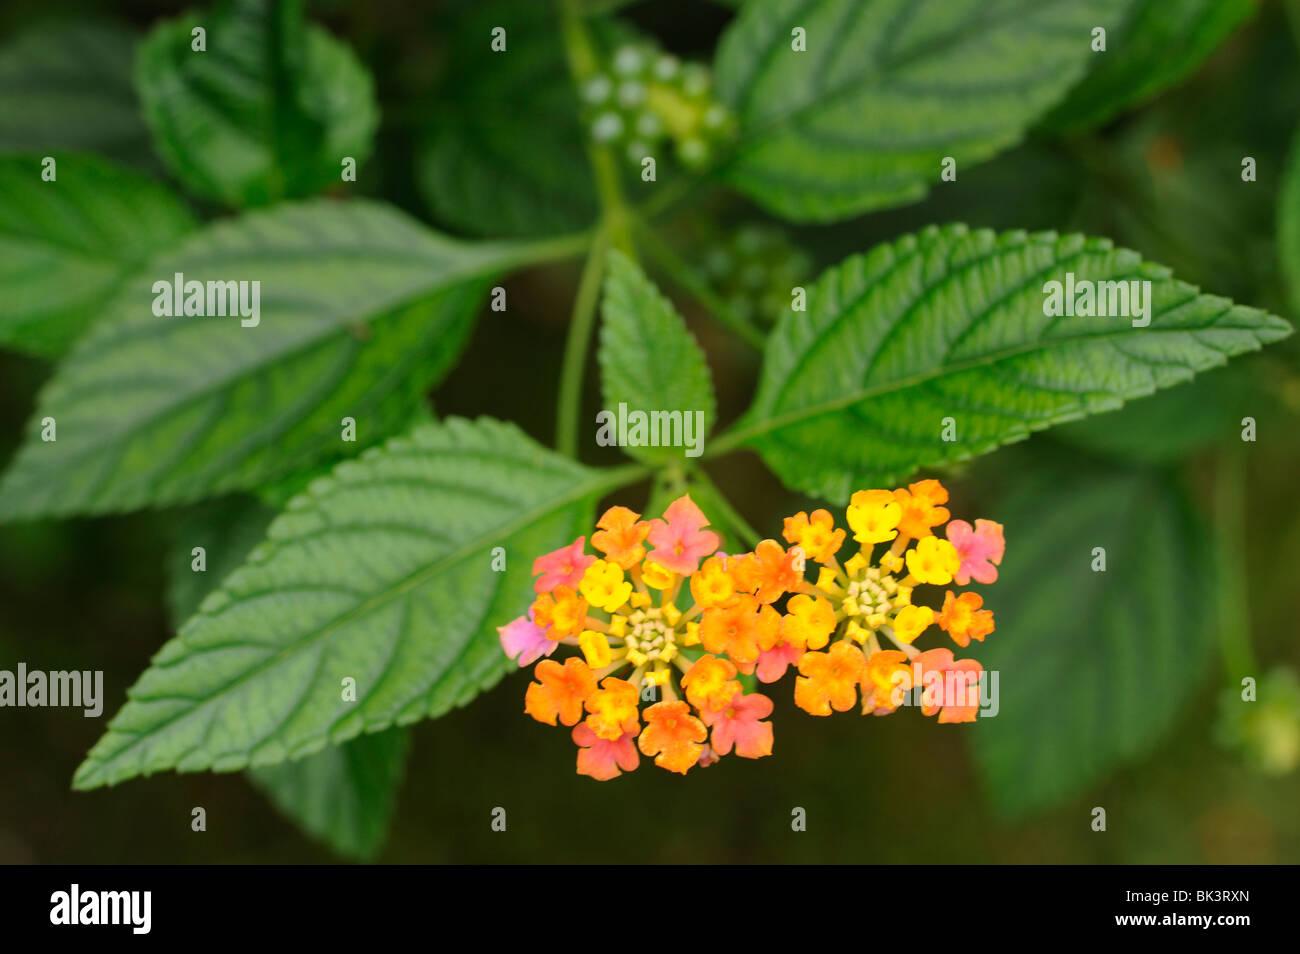 Lantana flowers on bush Stock Photo